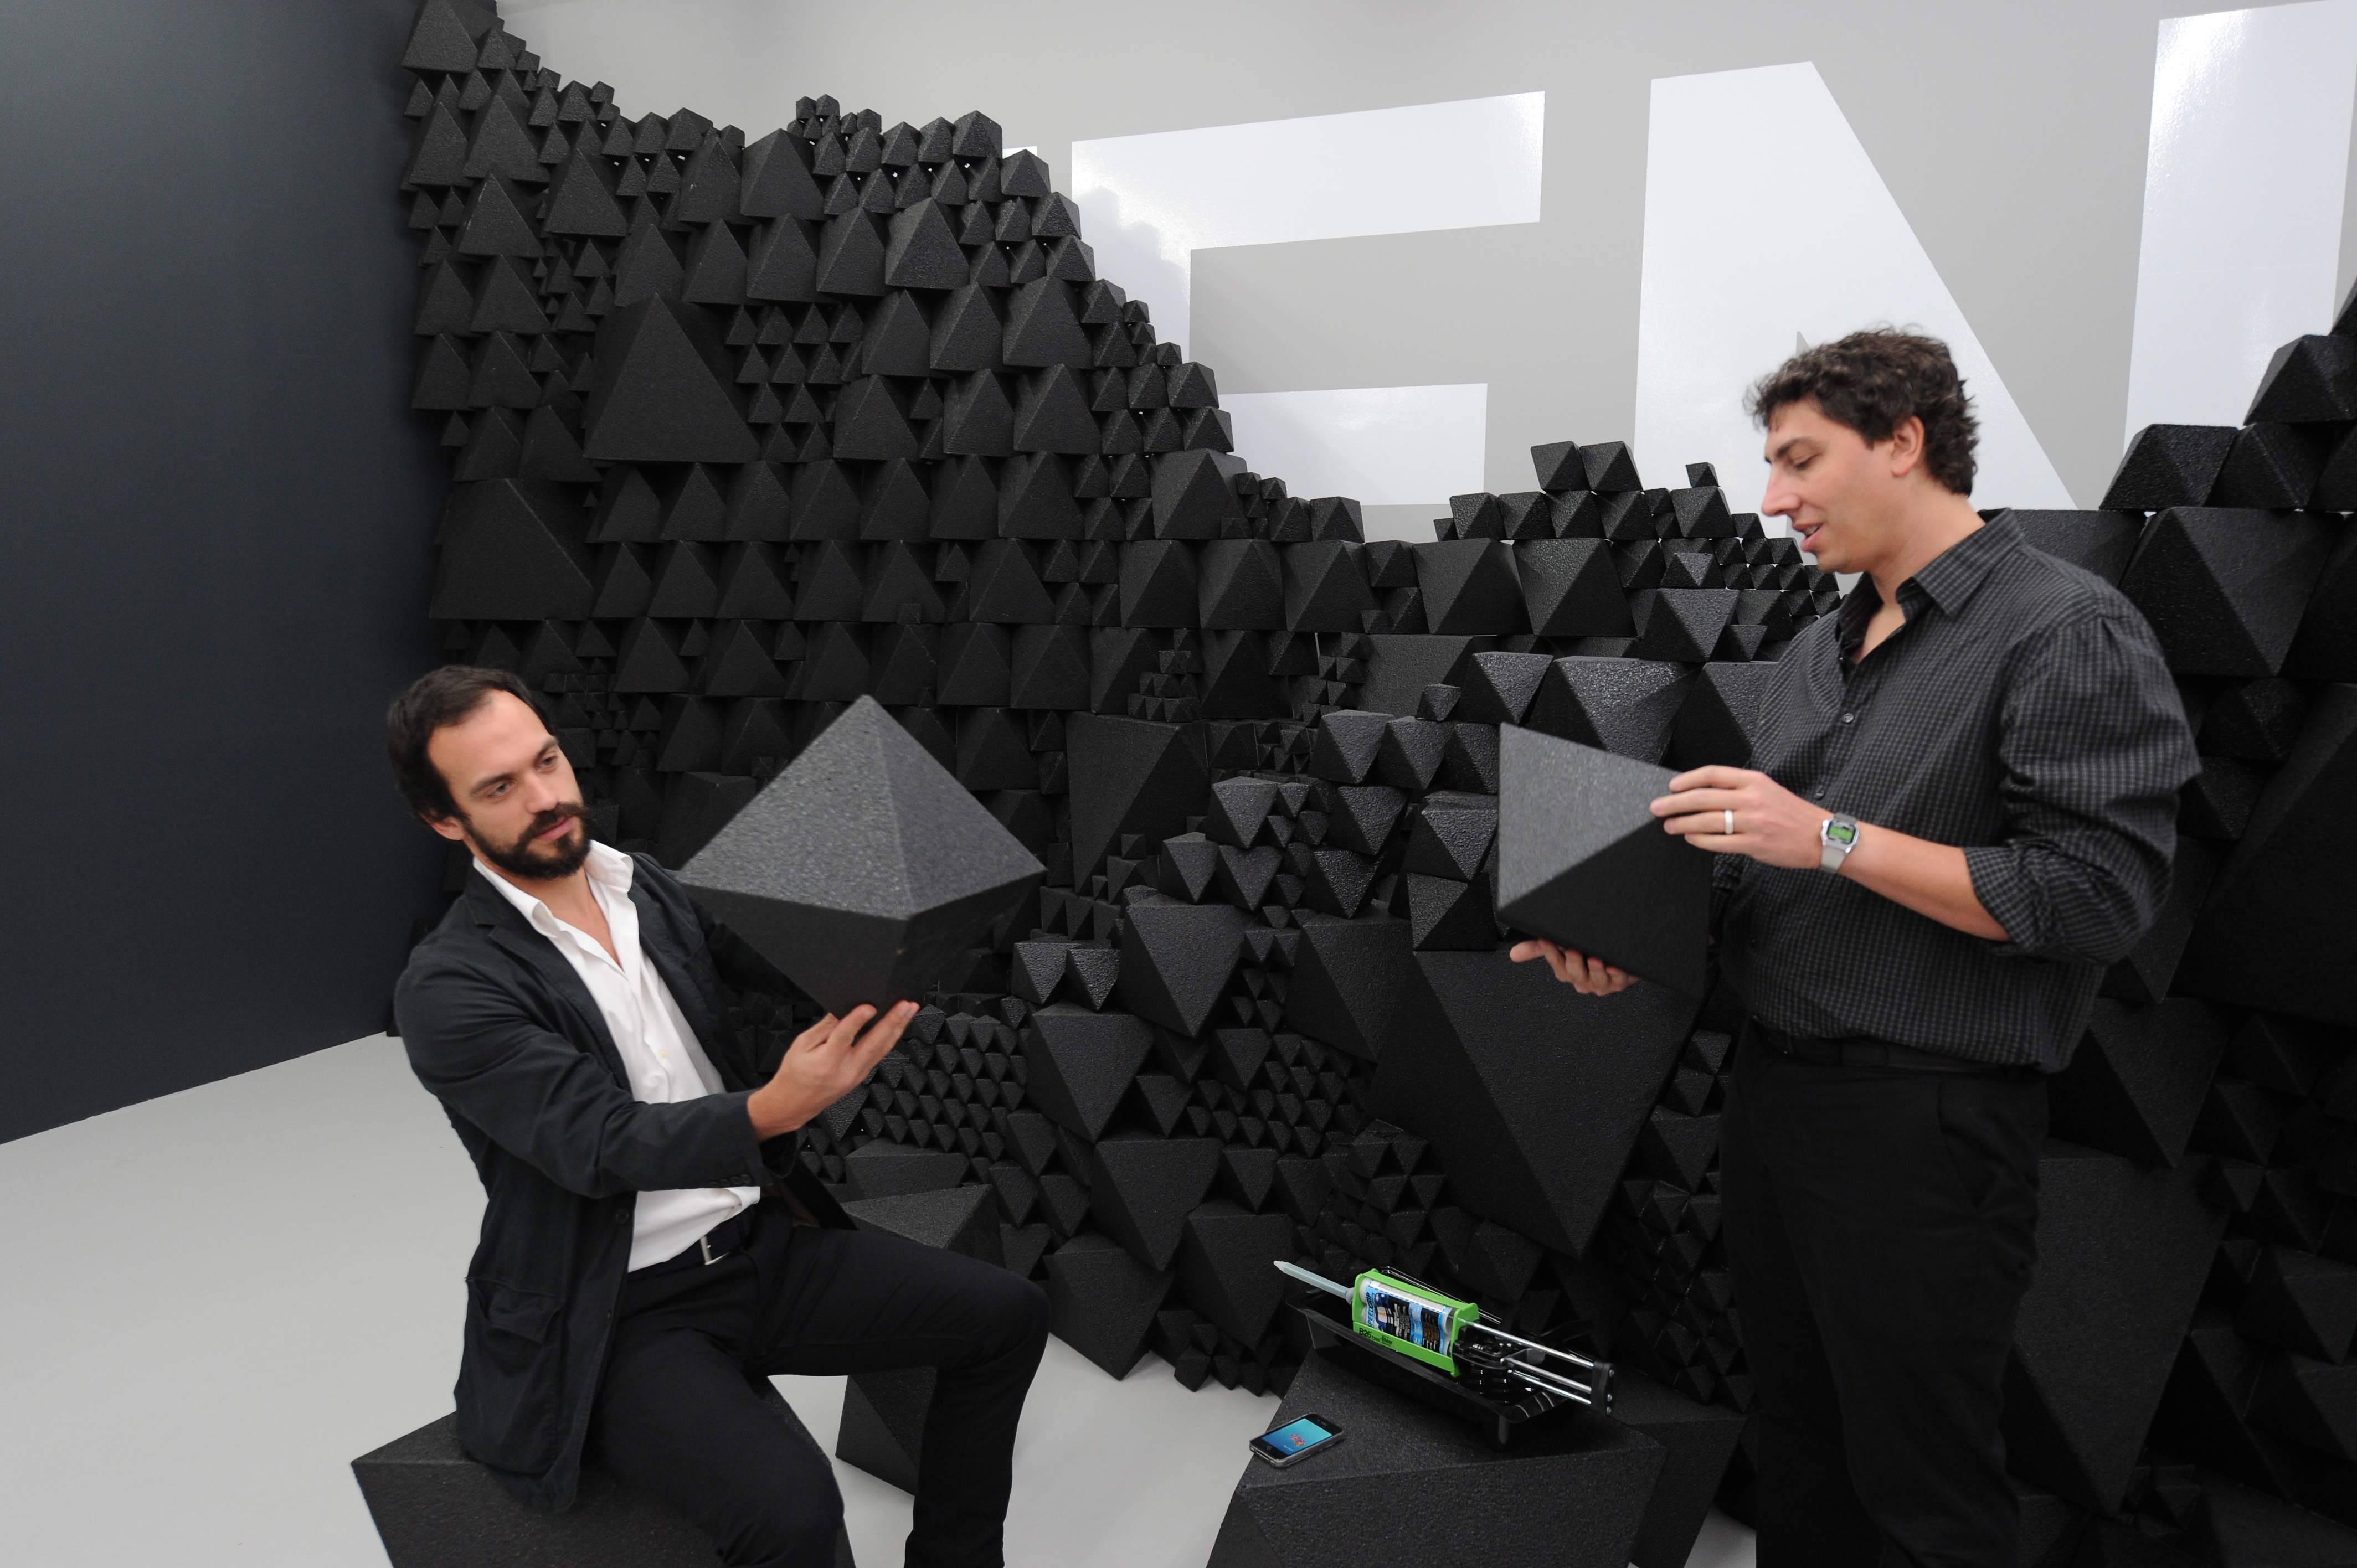 Benjamin Aranda and Chris Lasch creating a Modern Primitivei in the FENDI Aranda Lasch space at Design Miami_December 2010_1[2]